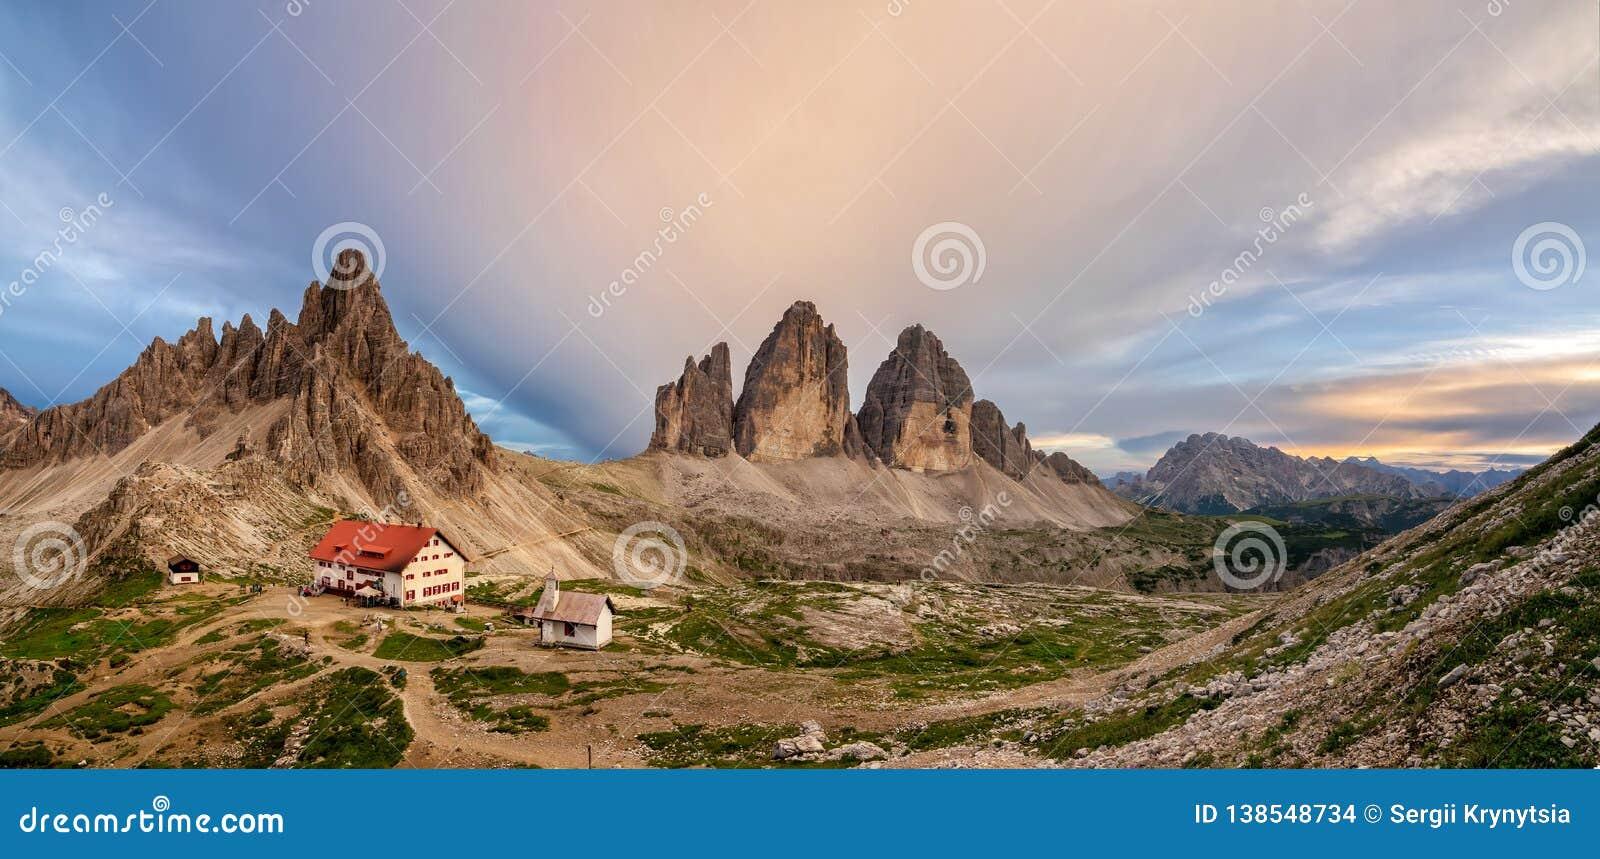 Gran vista panorámica de Tre Cime, de su choza y de la capilla Tre Cime di Lavaredo National Park, dolomías, Italia